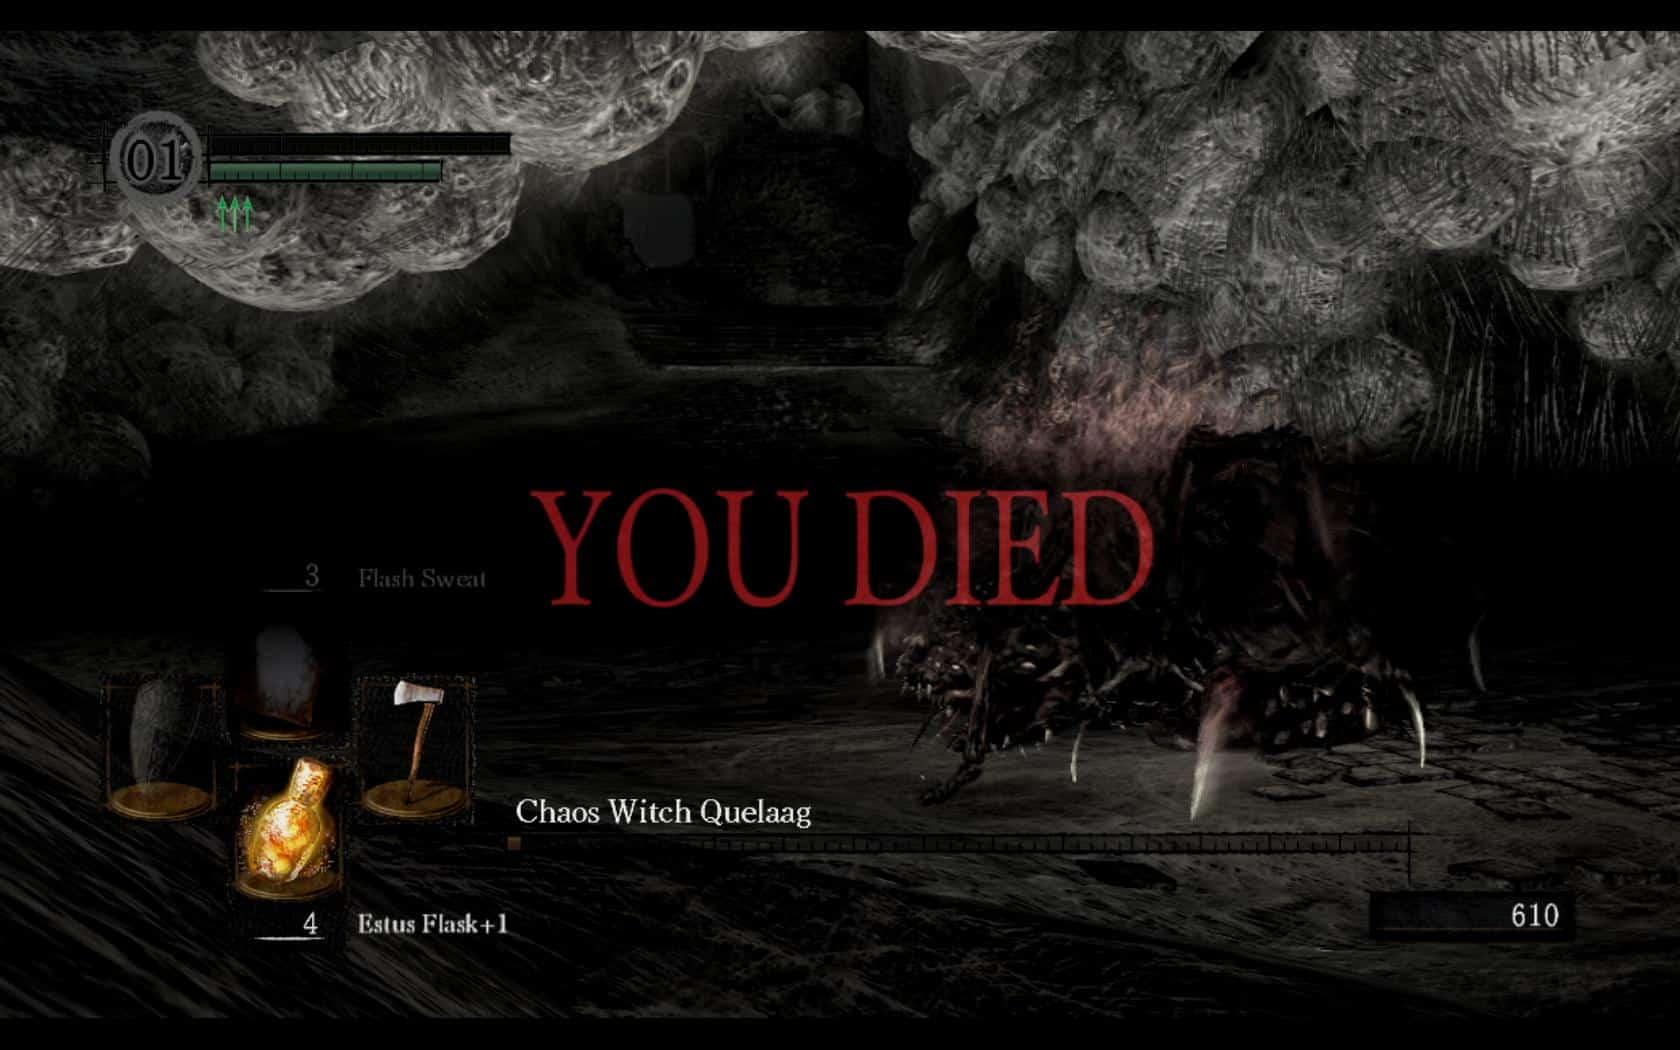 you died game over video games dark souls bloodborne demon's souls